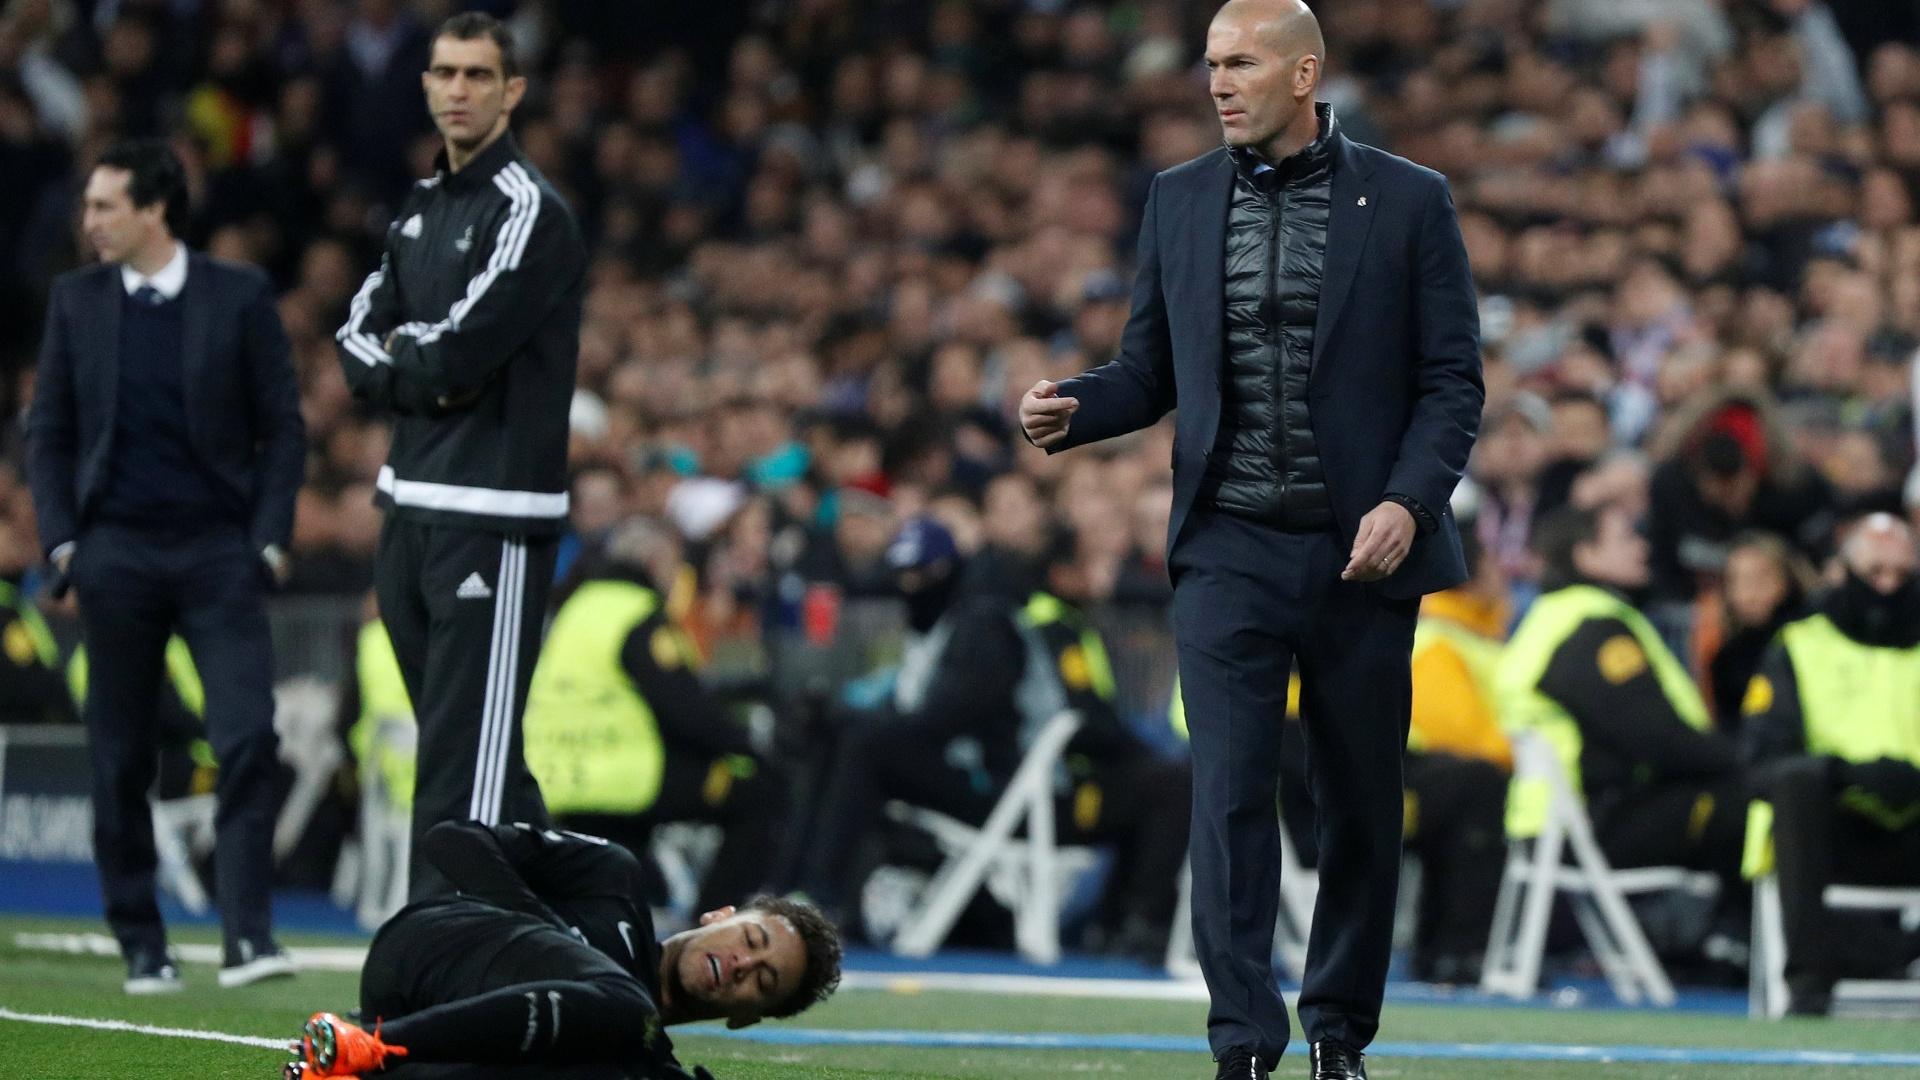 Zidane orienta o Real Madrid